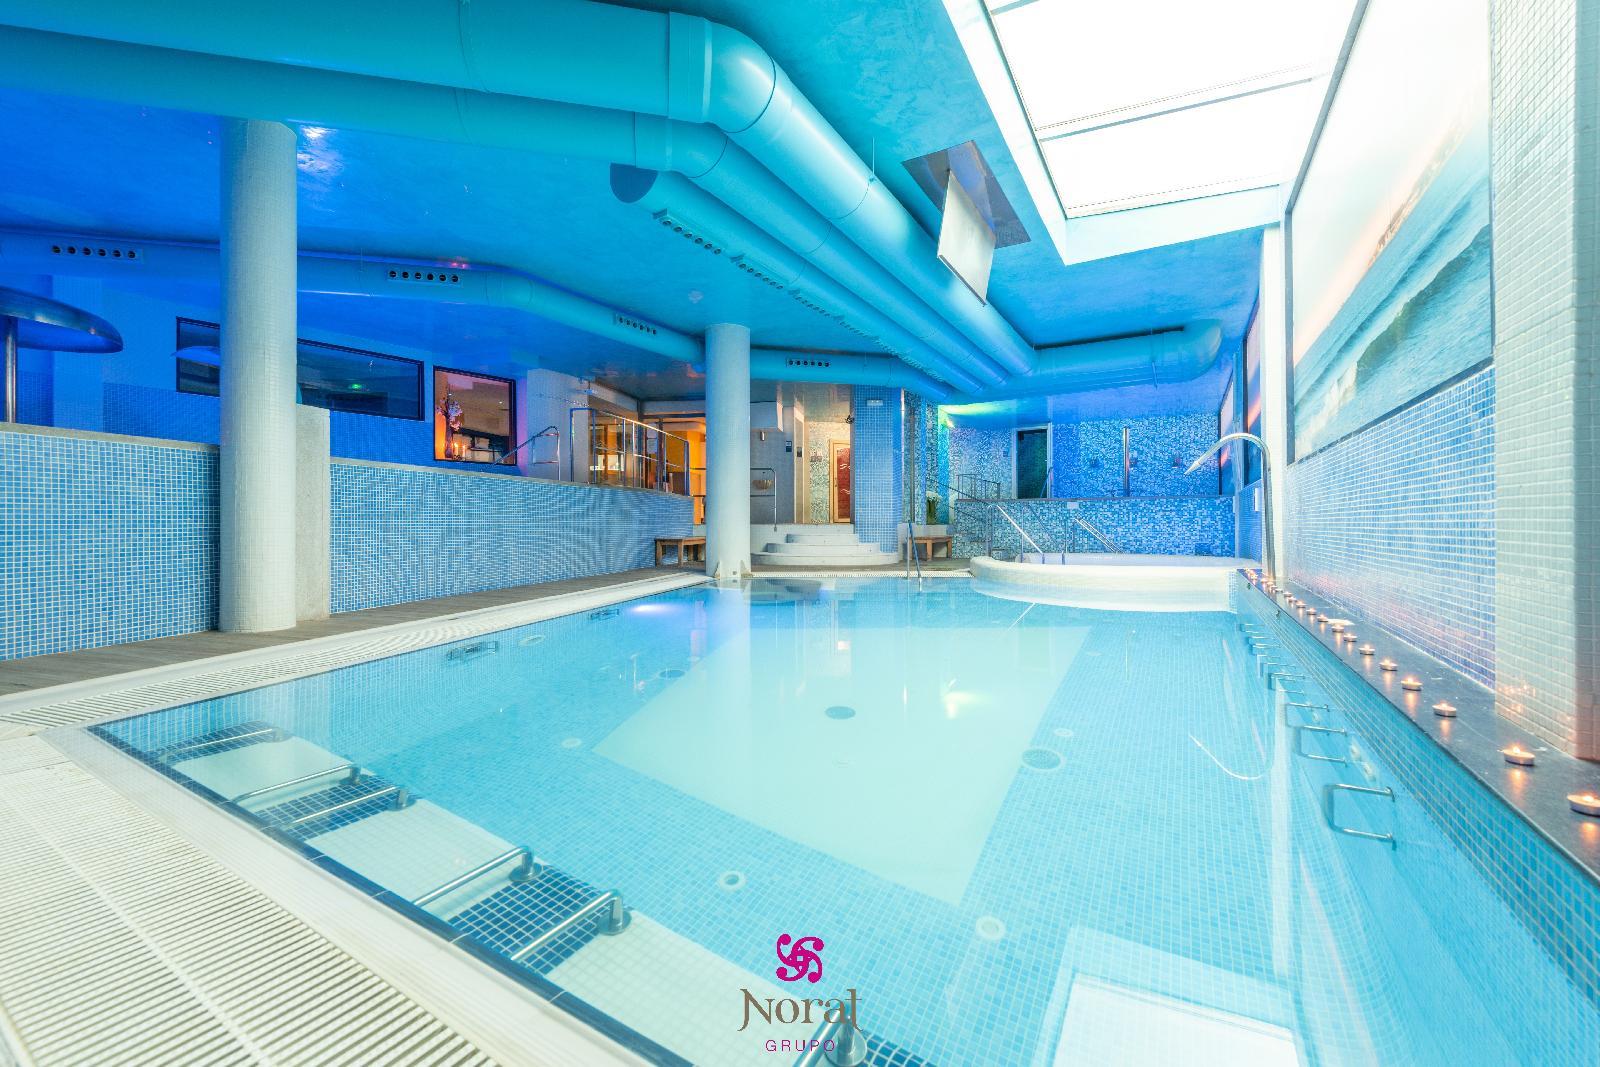 26. Hotel Spa Norat O Grove